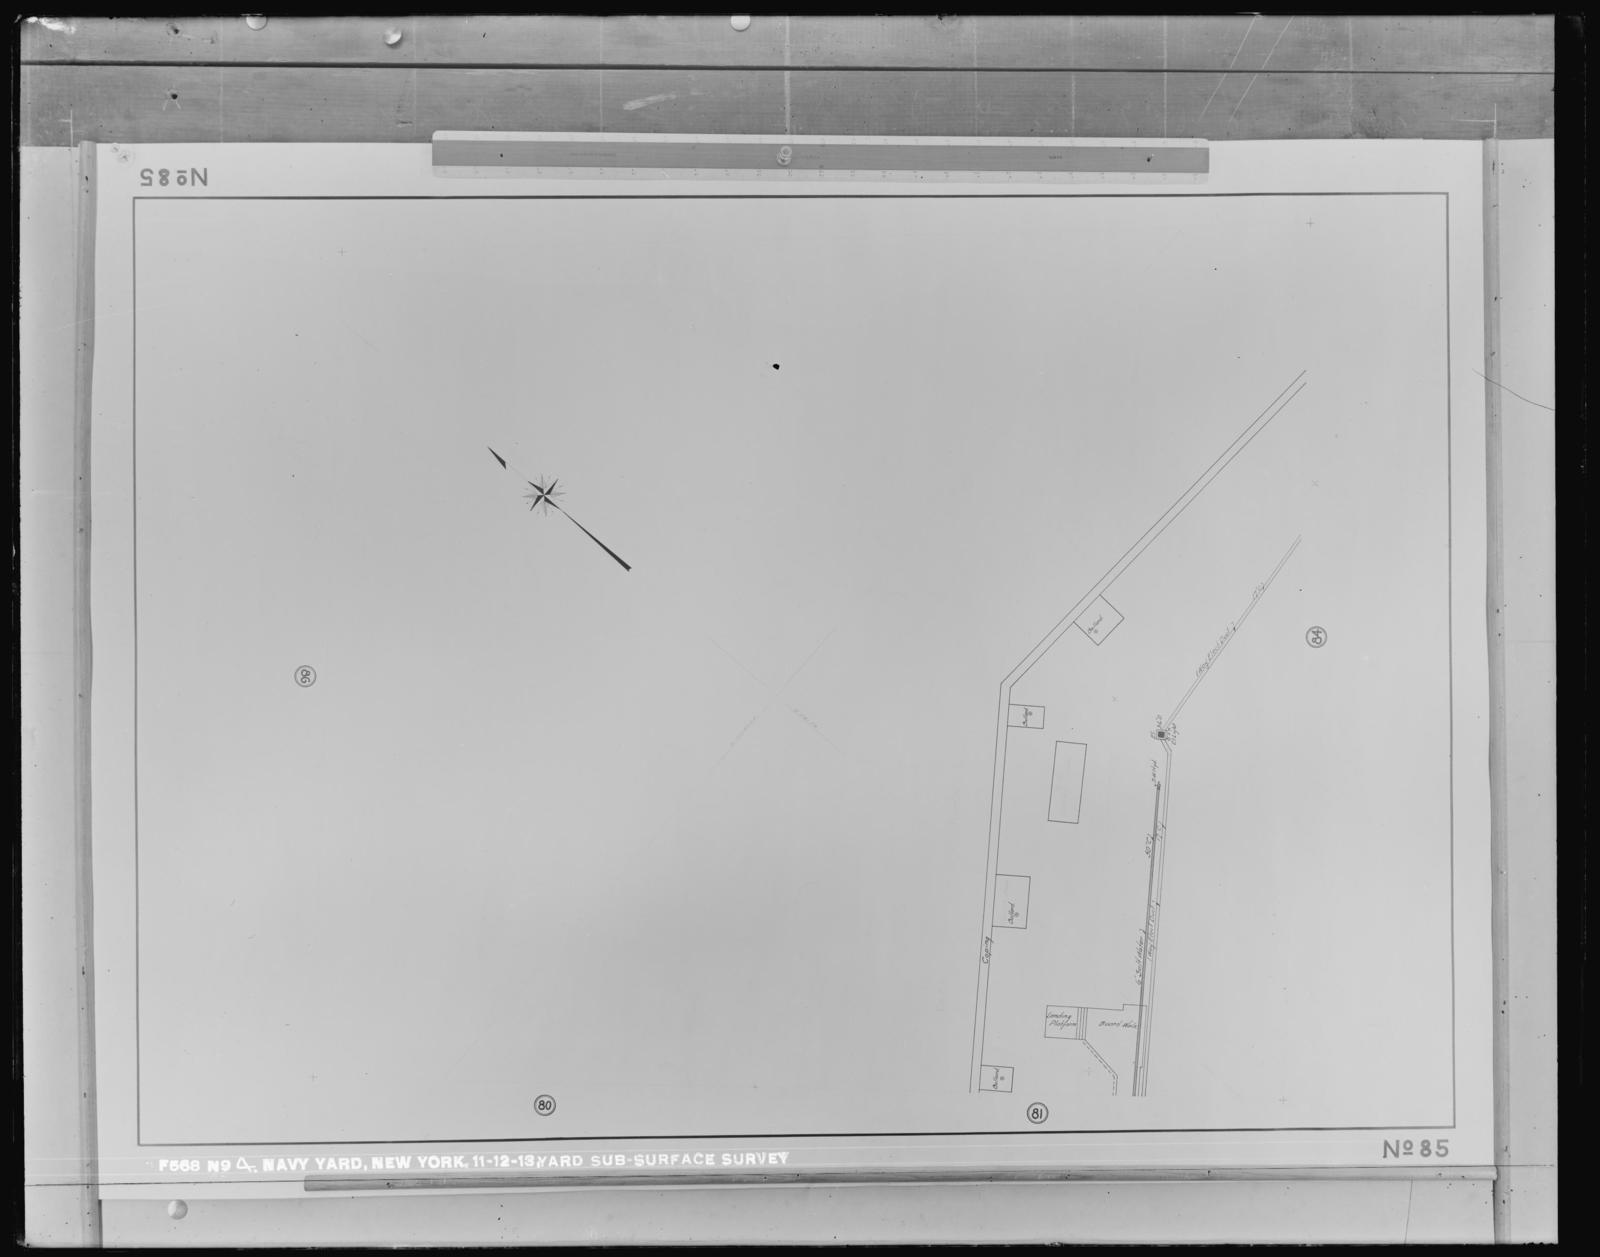 Yard Sub-Surface Survey